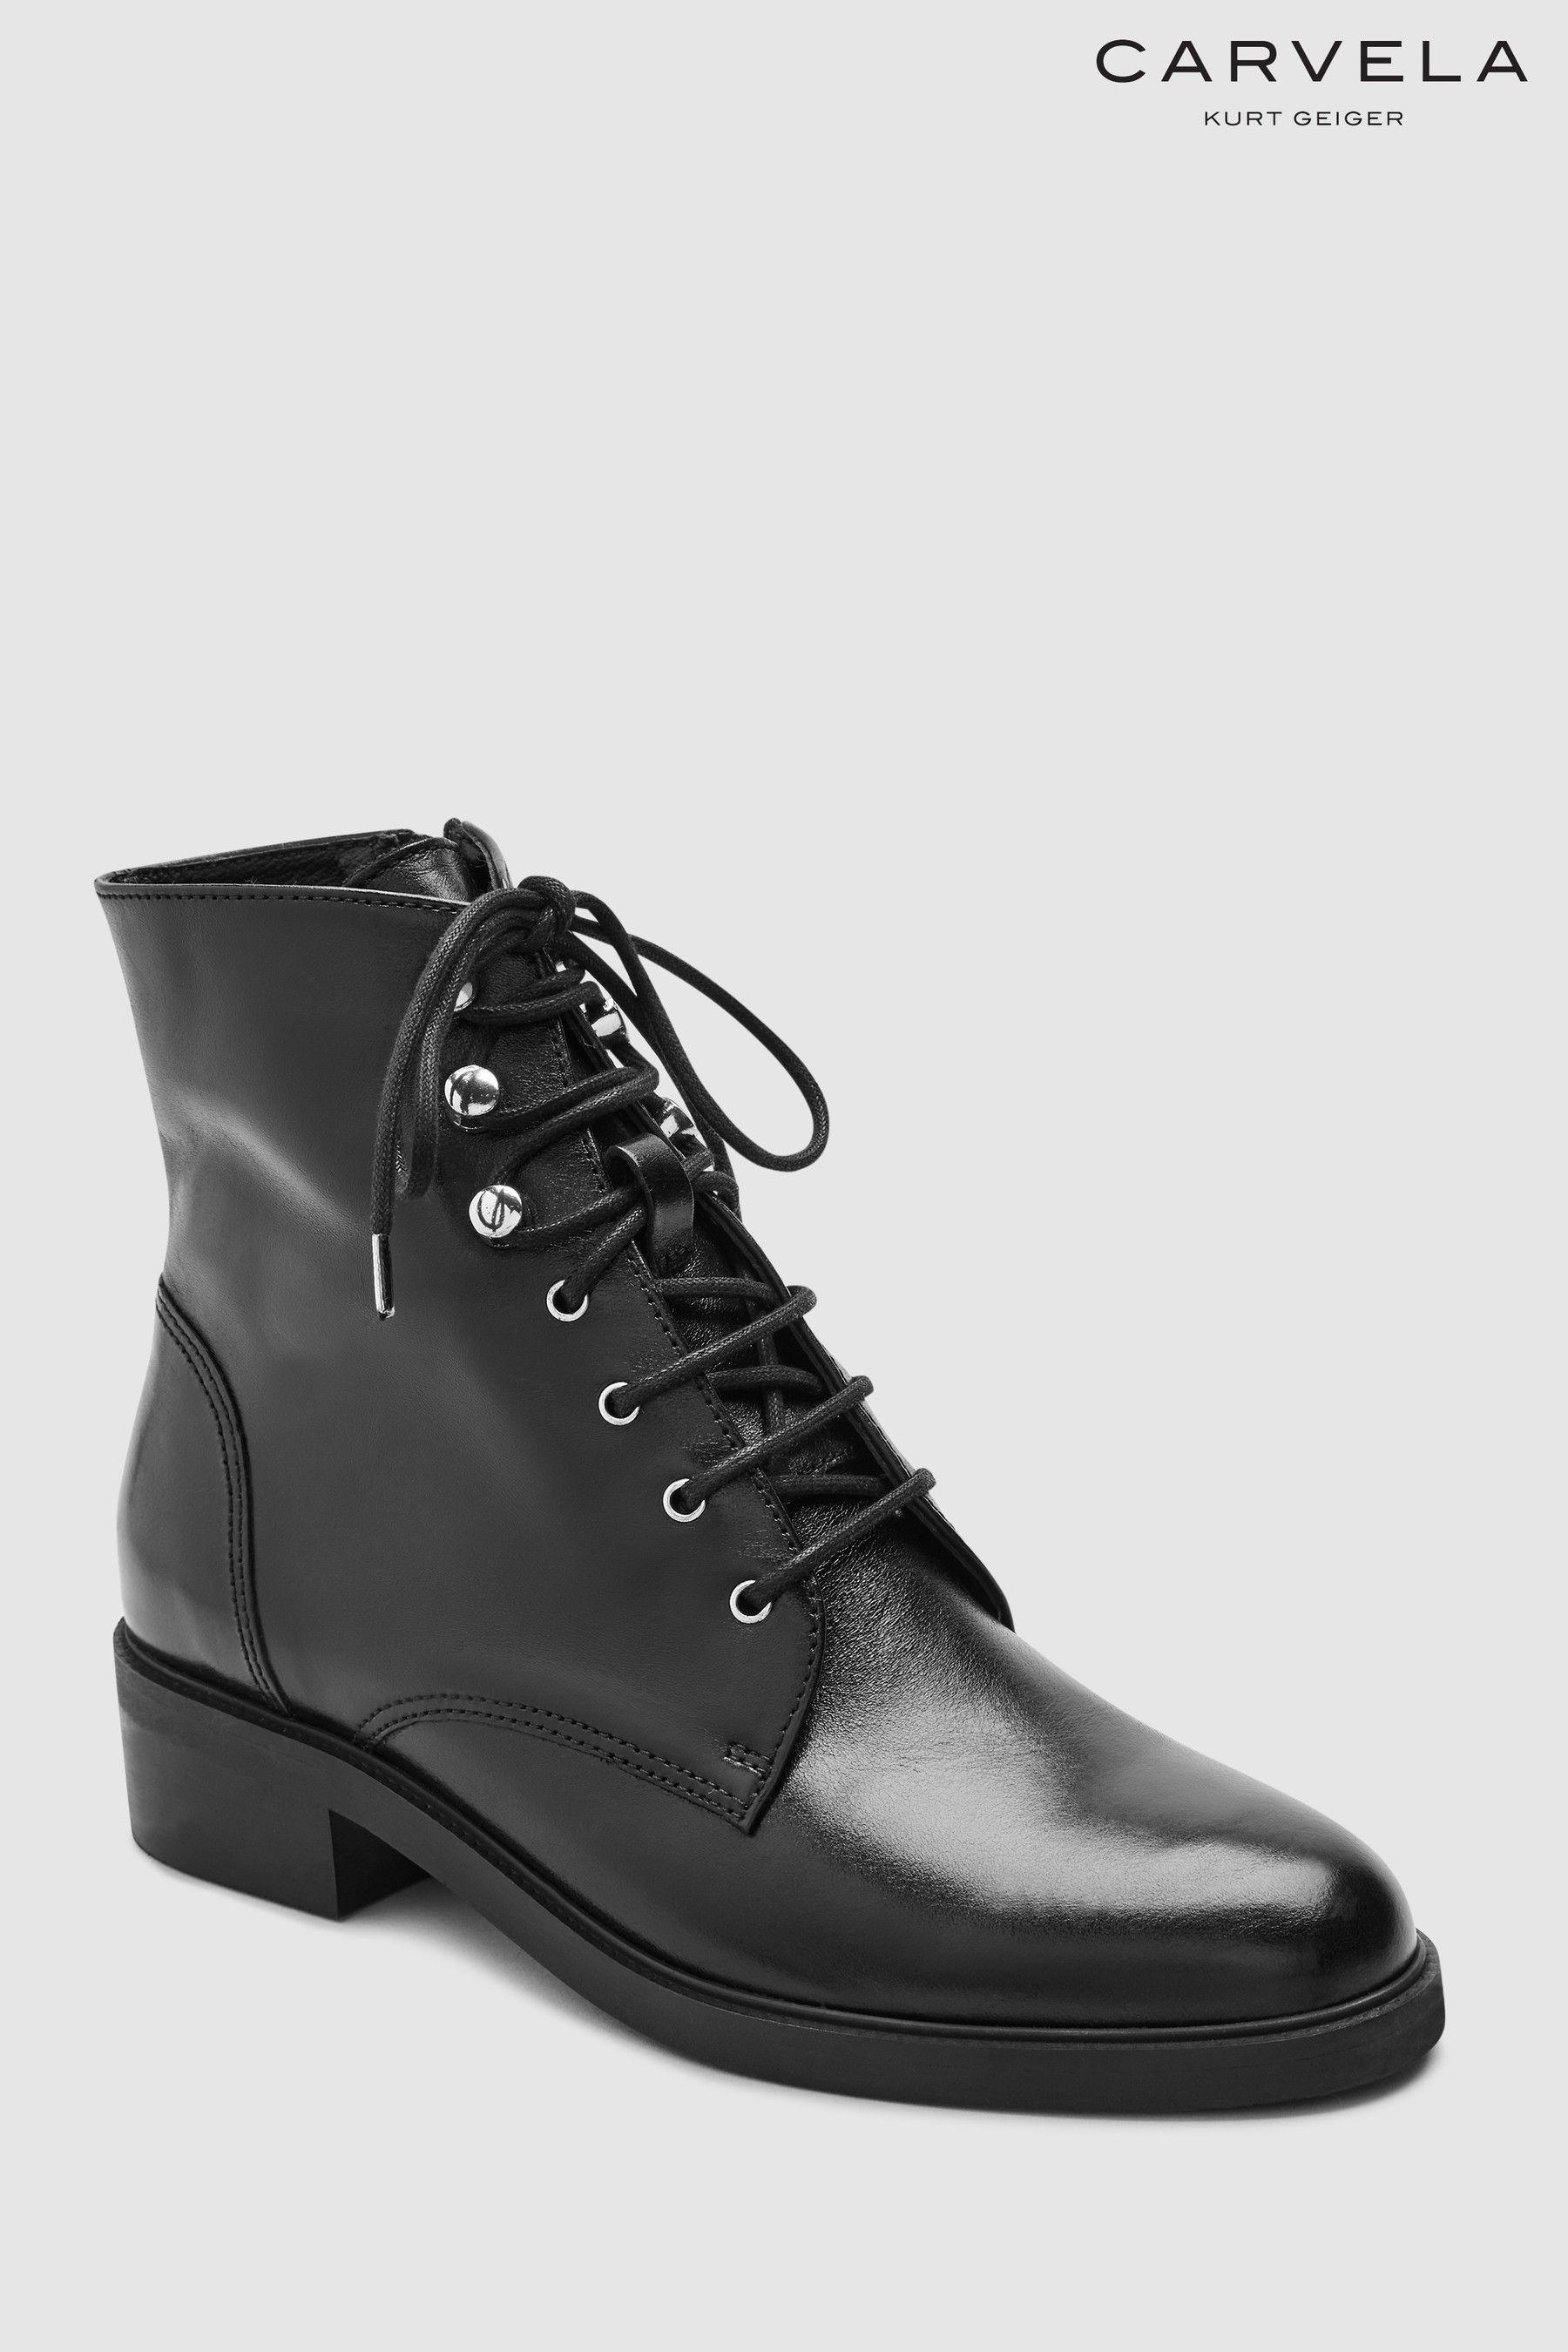 kurt geiger skewer boots online 3da7c efa24